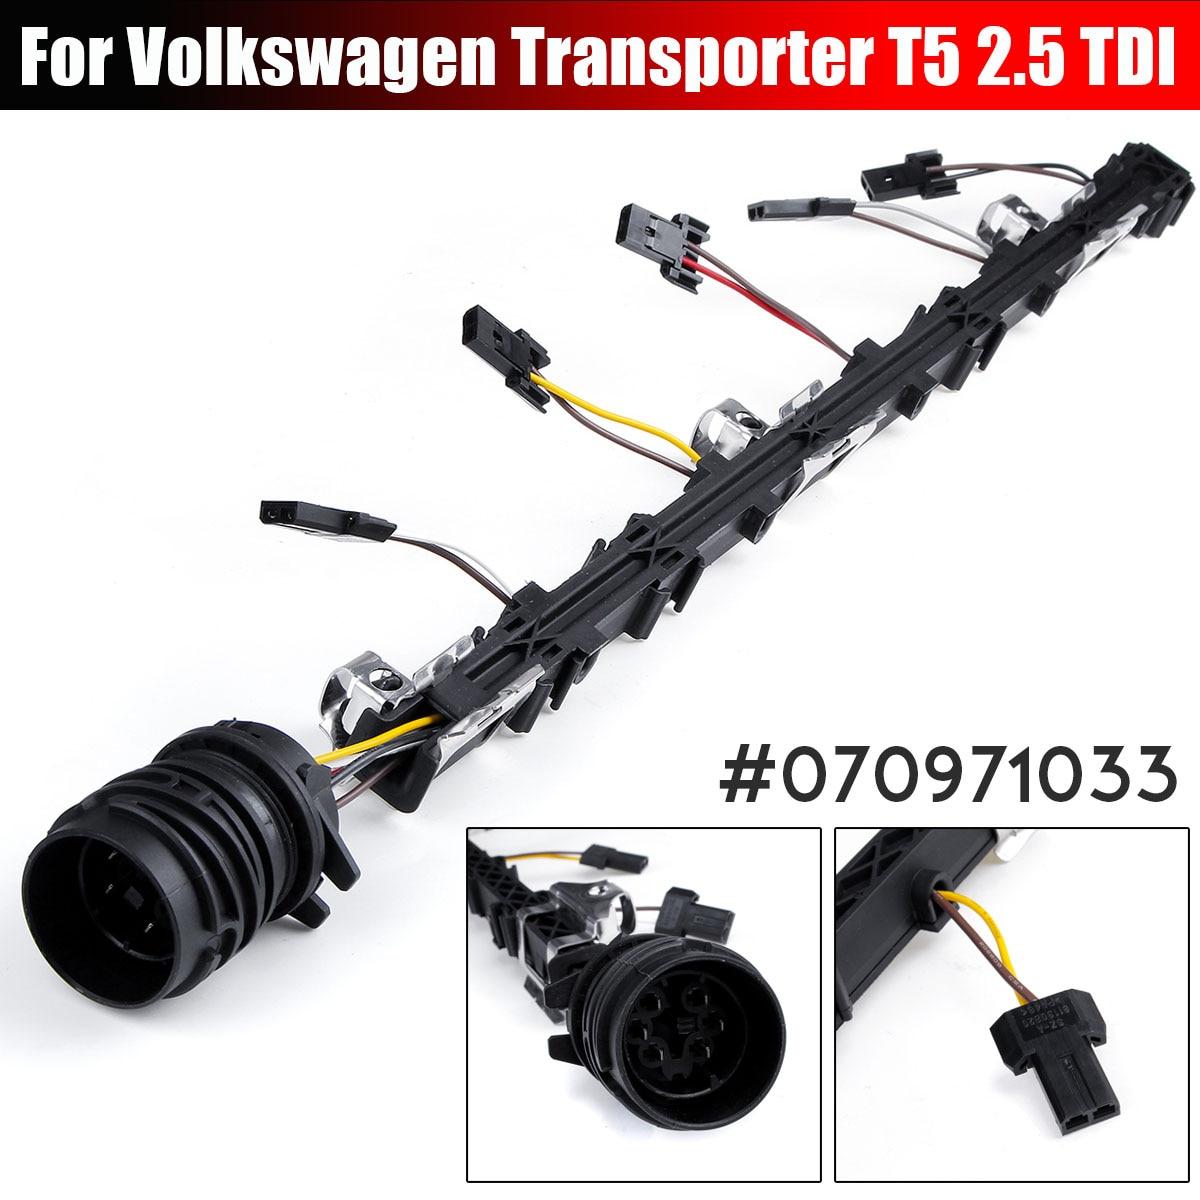 Cableado de inyector telar 2,5 TDI PD motor diésel 070971033 cableado de cables para Volkswagen para VW para Transporter T5